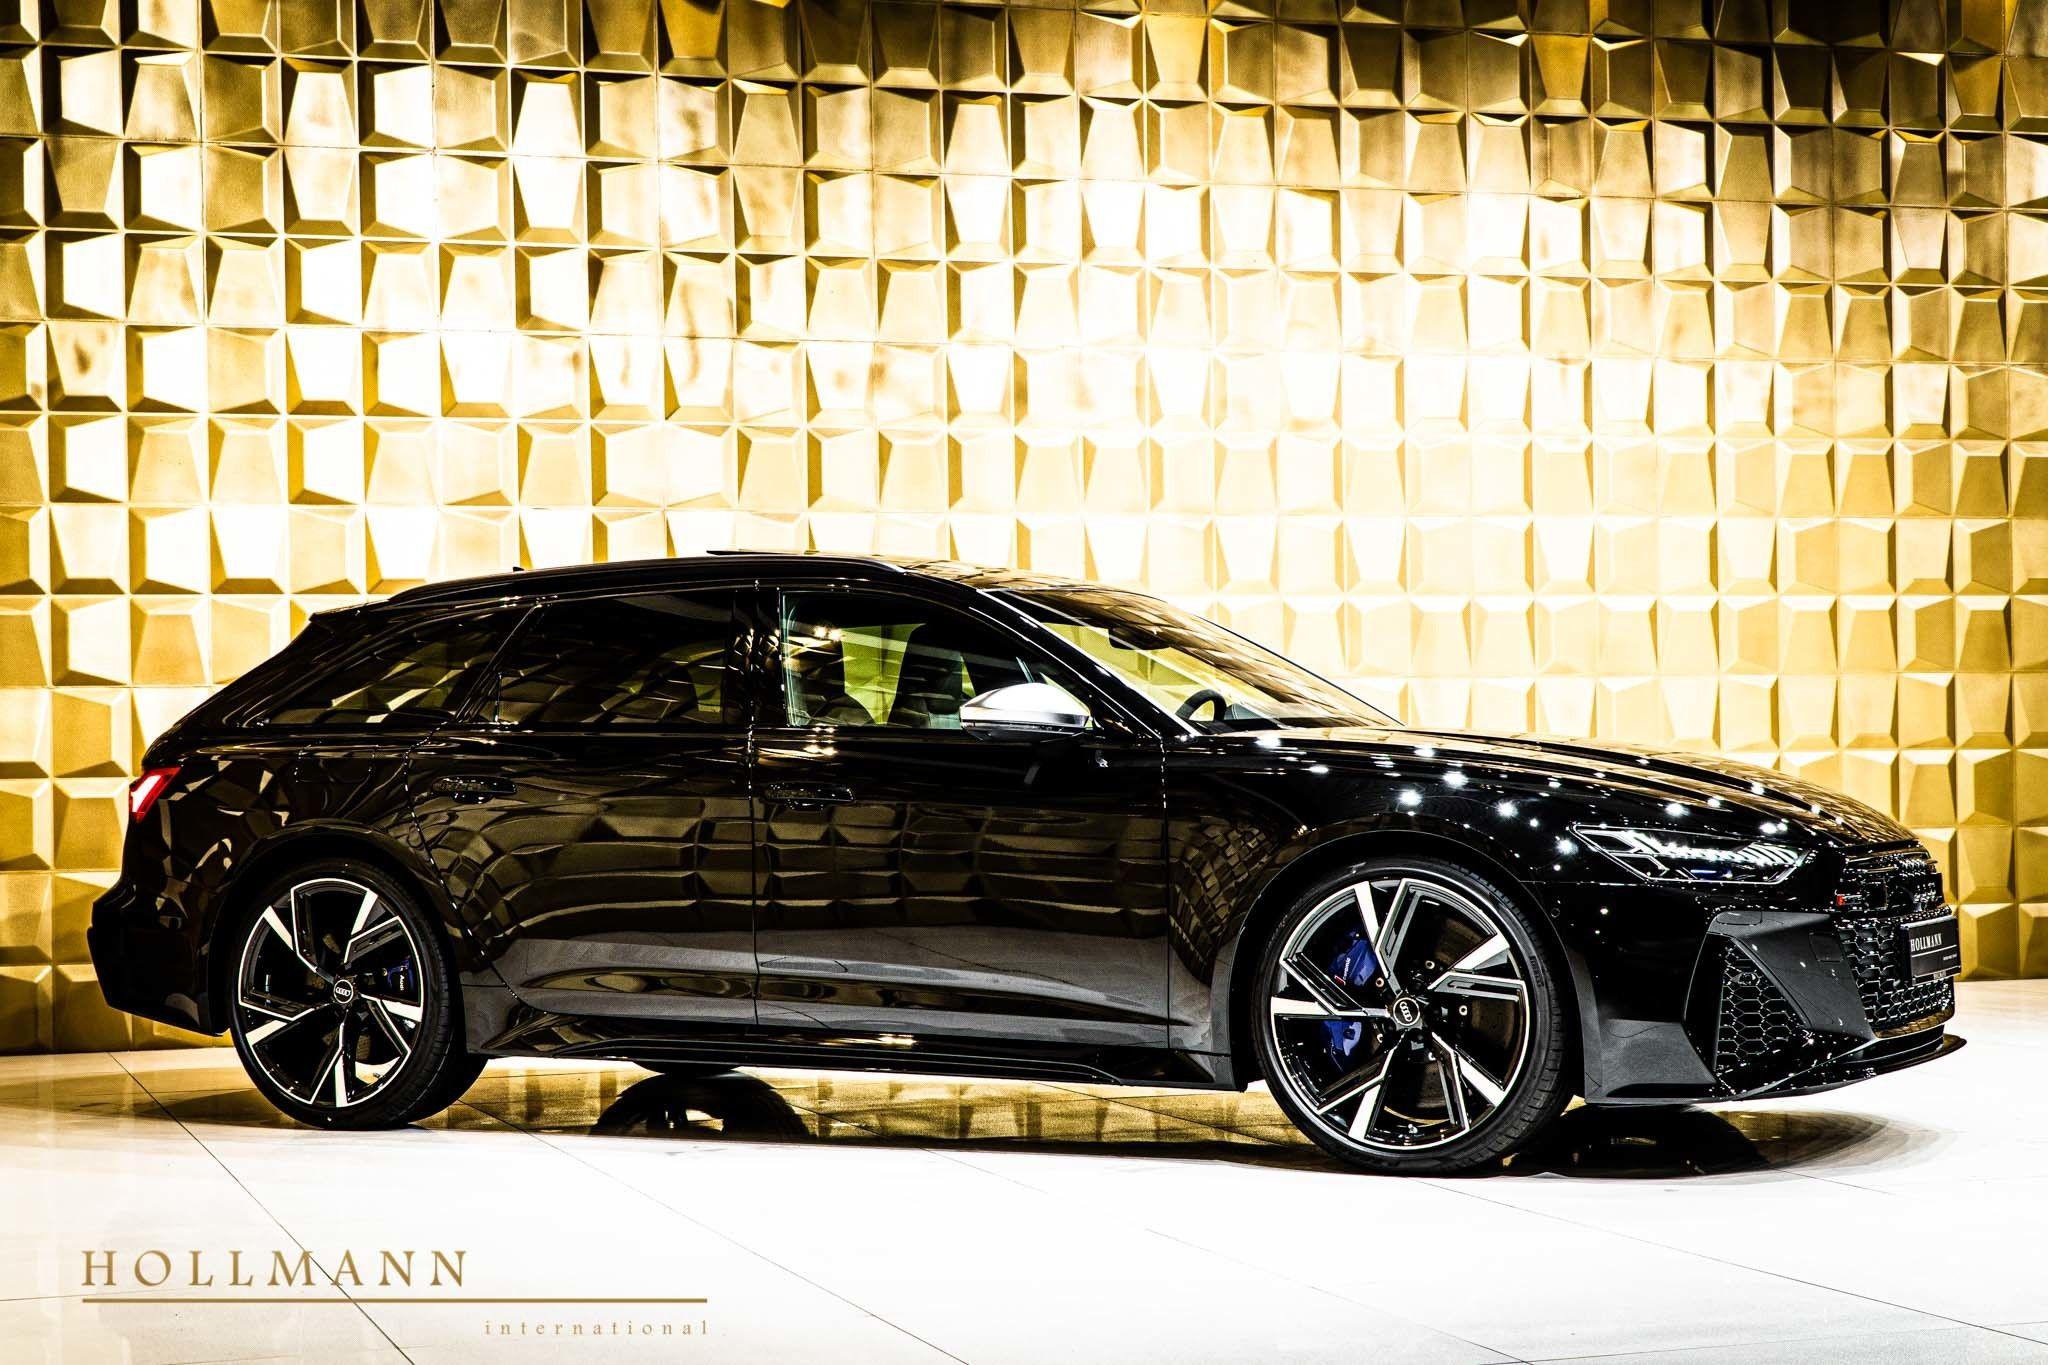 Audi Rs6 Avant Hollmann International Germany For Sale On Luxurypulse Em 2020 Treino Para Meninas Carros Esportivos Carros